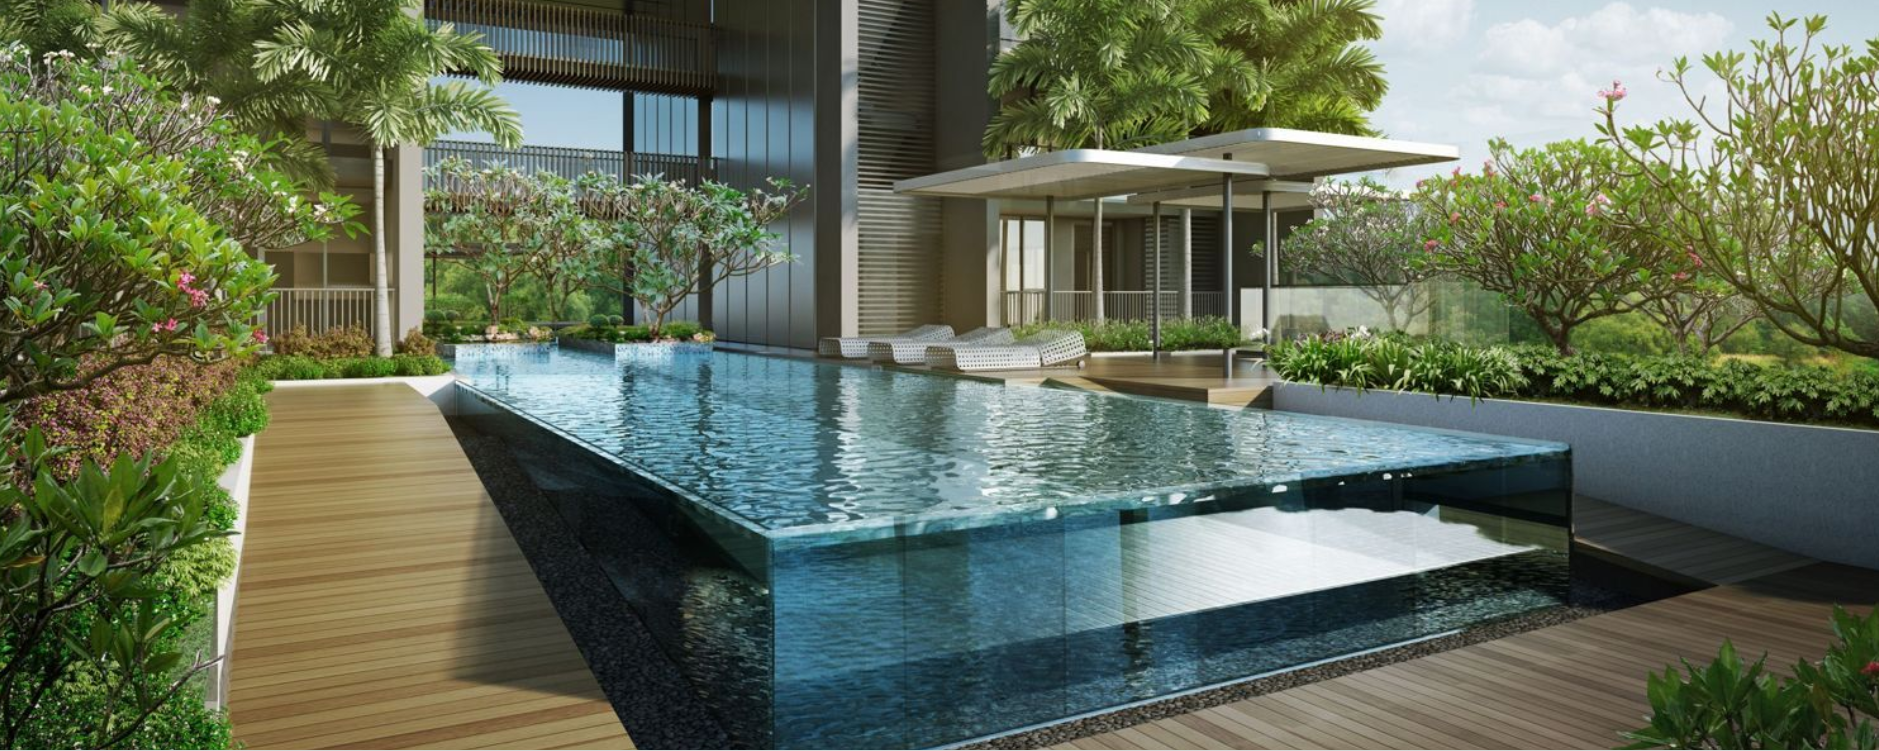 Swimming Pool Water Features Singapore Portfolio Part 2